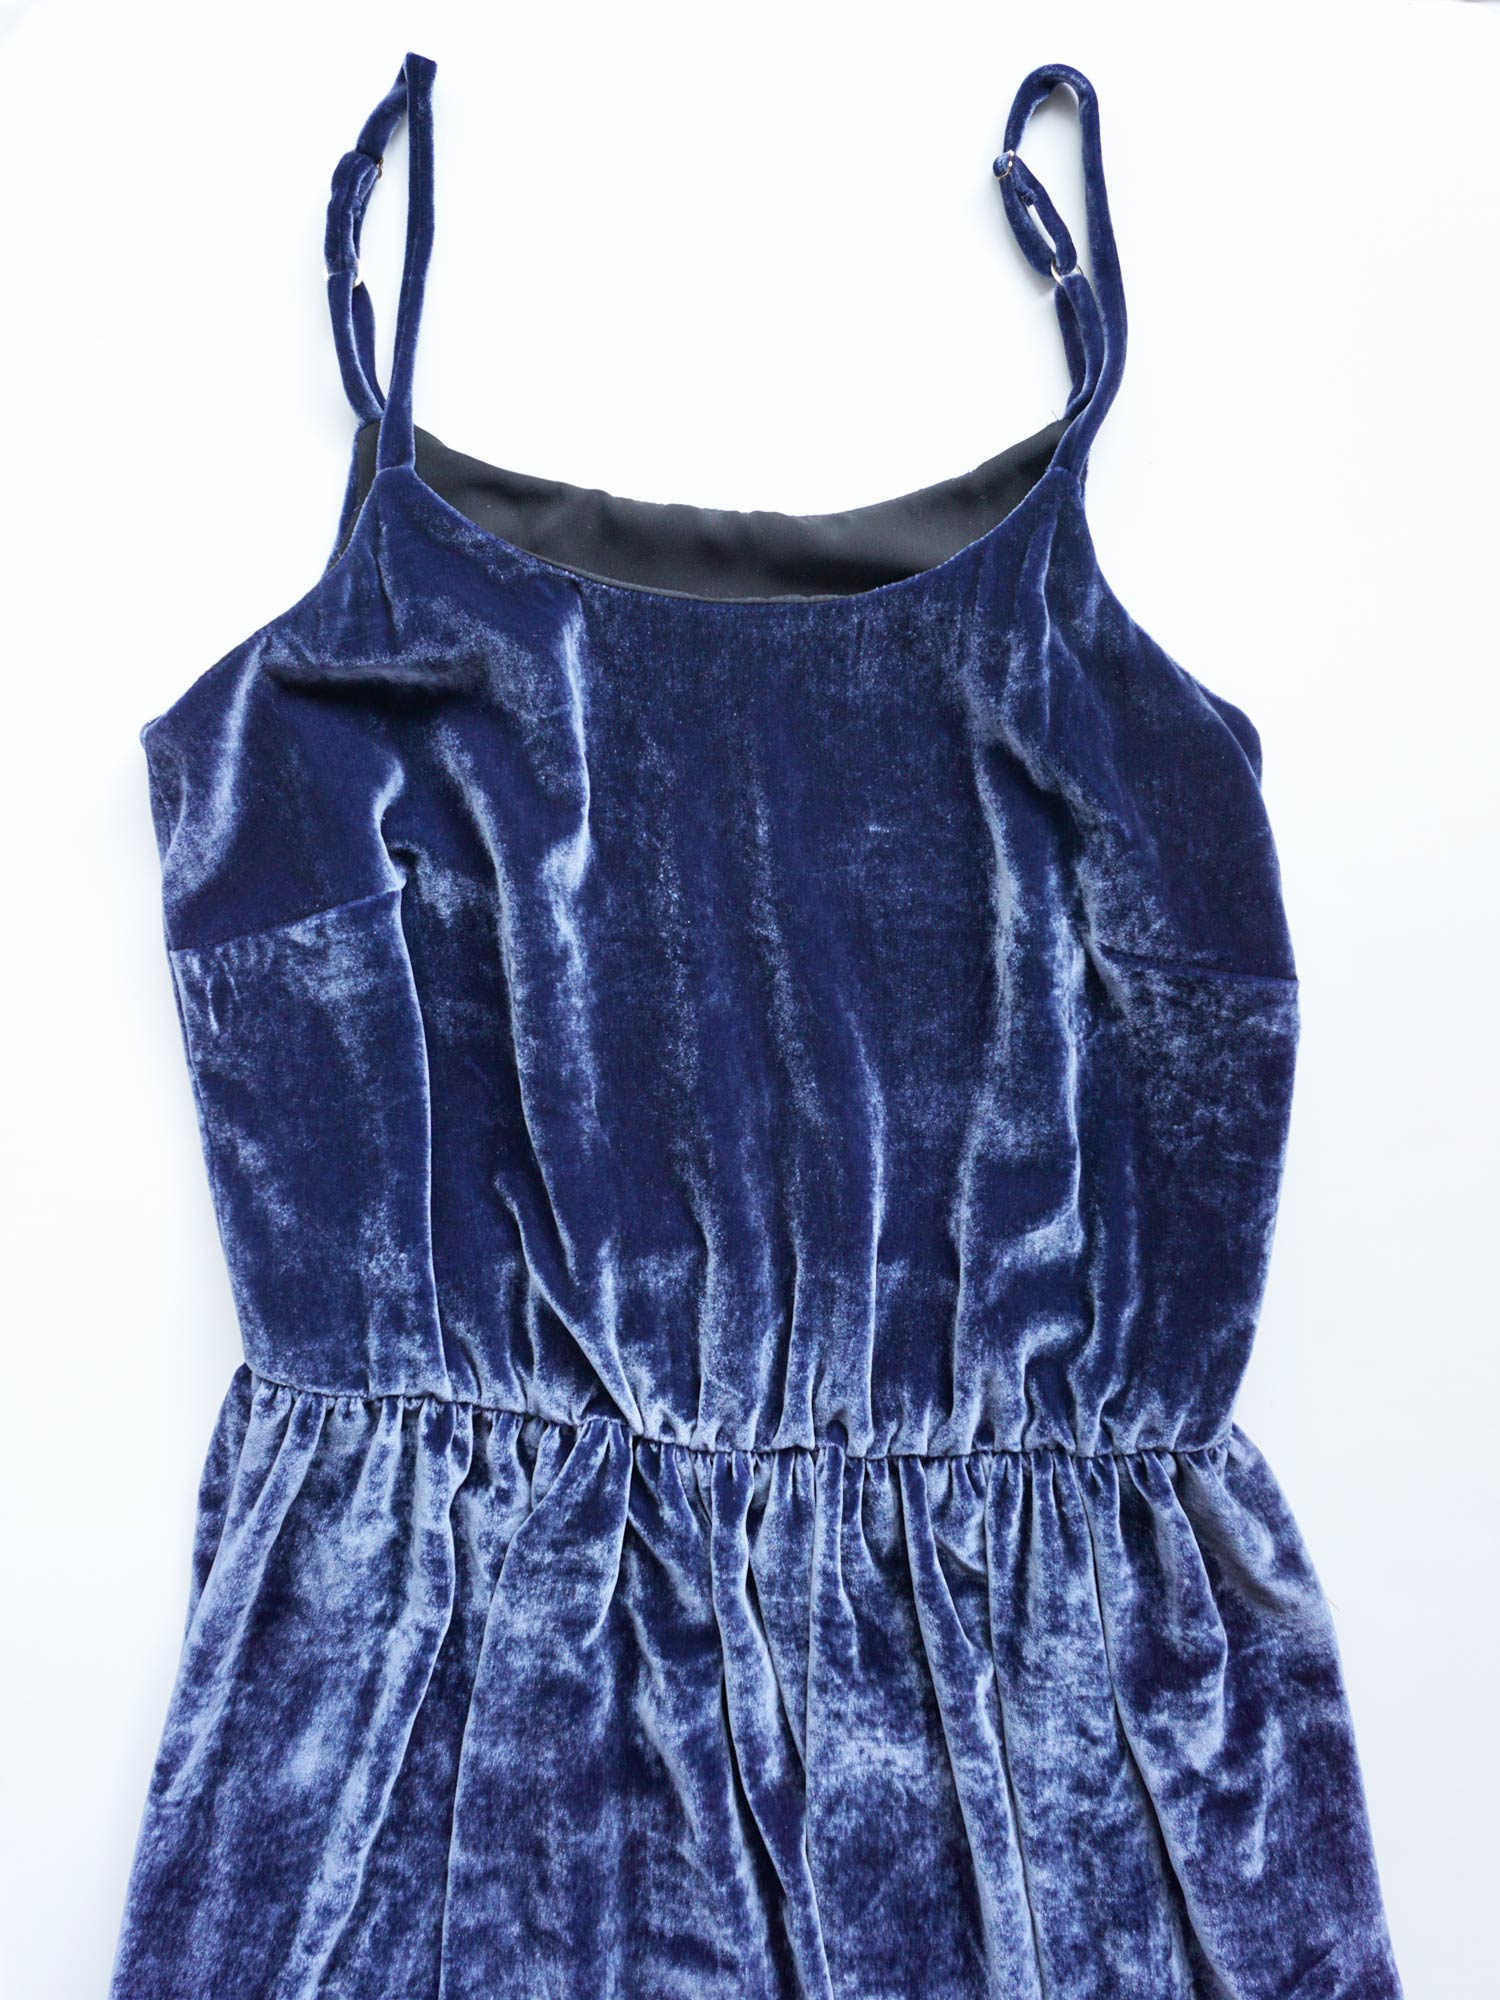 DIY Velvet Slip Dress – Catarina Dress by Seamwork | Sew DIY